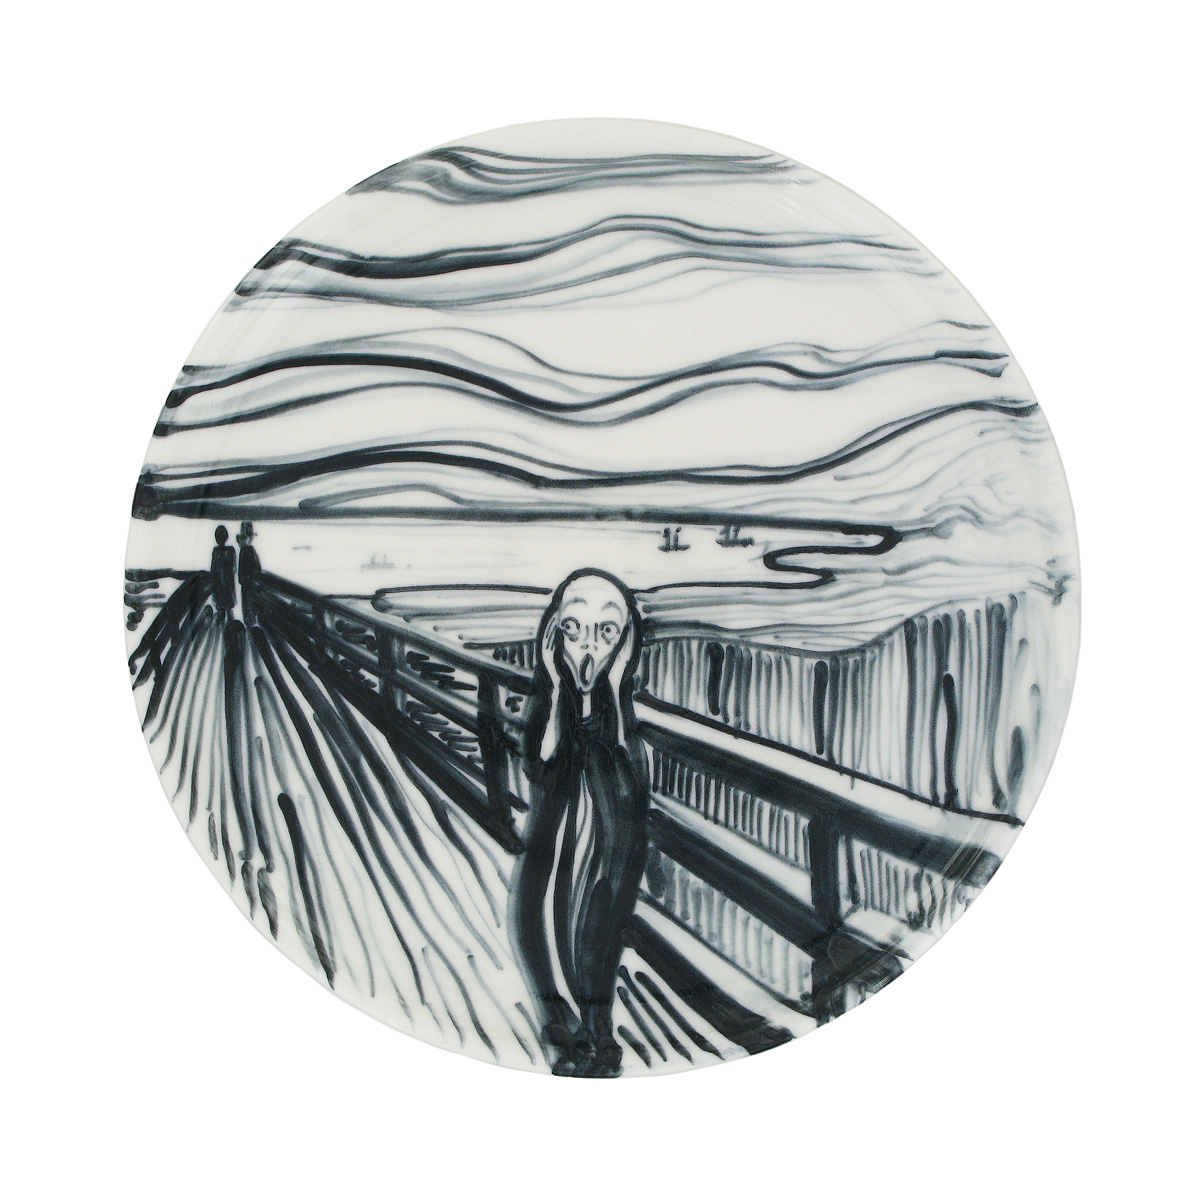 The Scream Plate